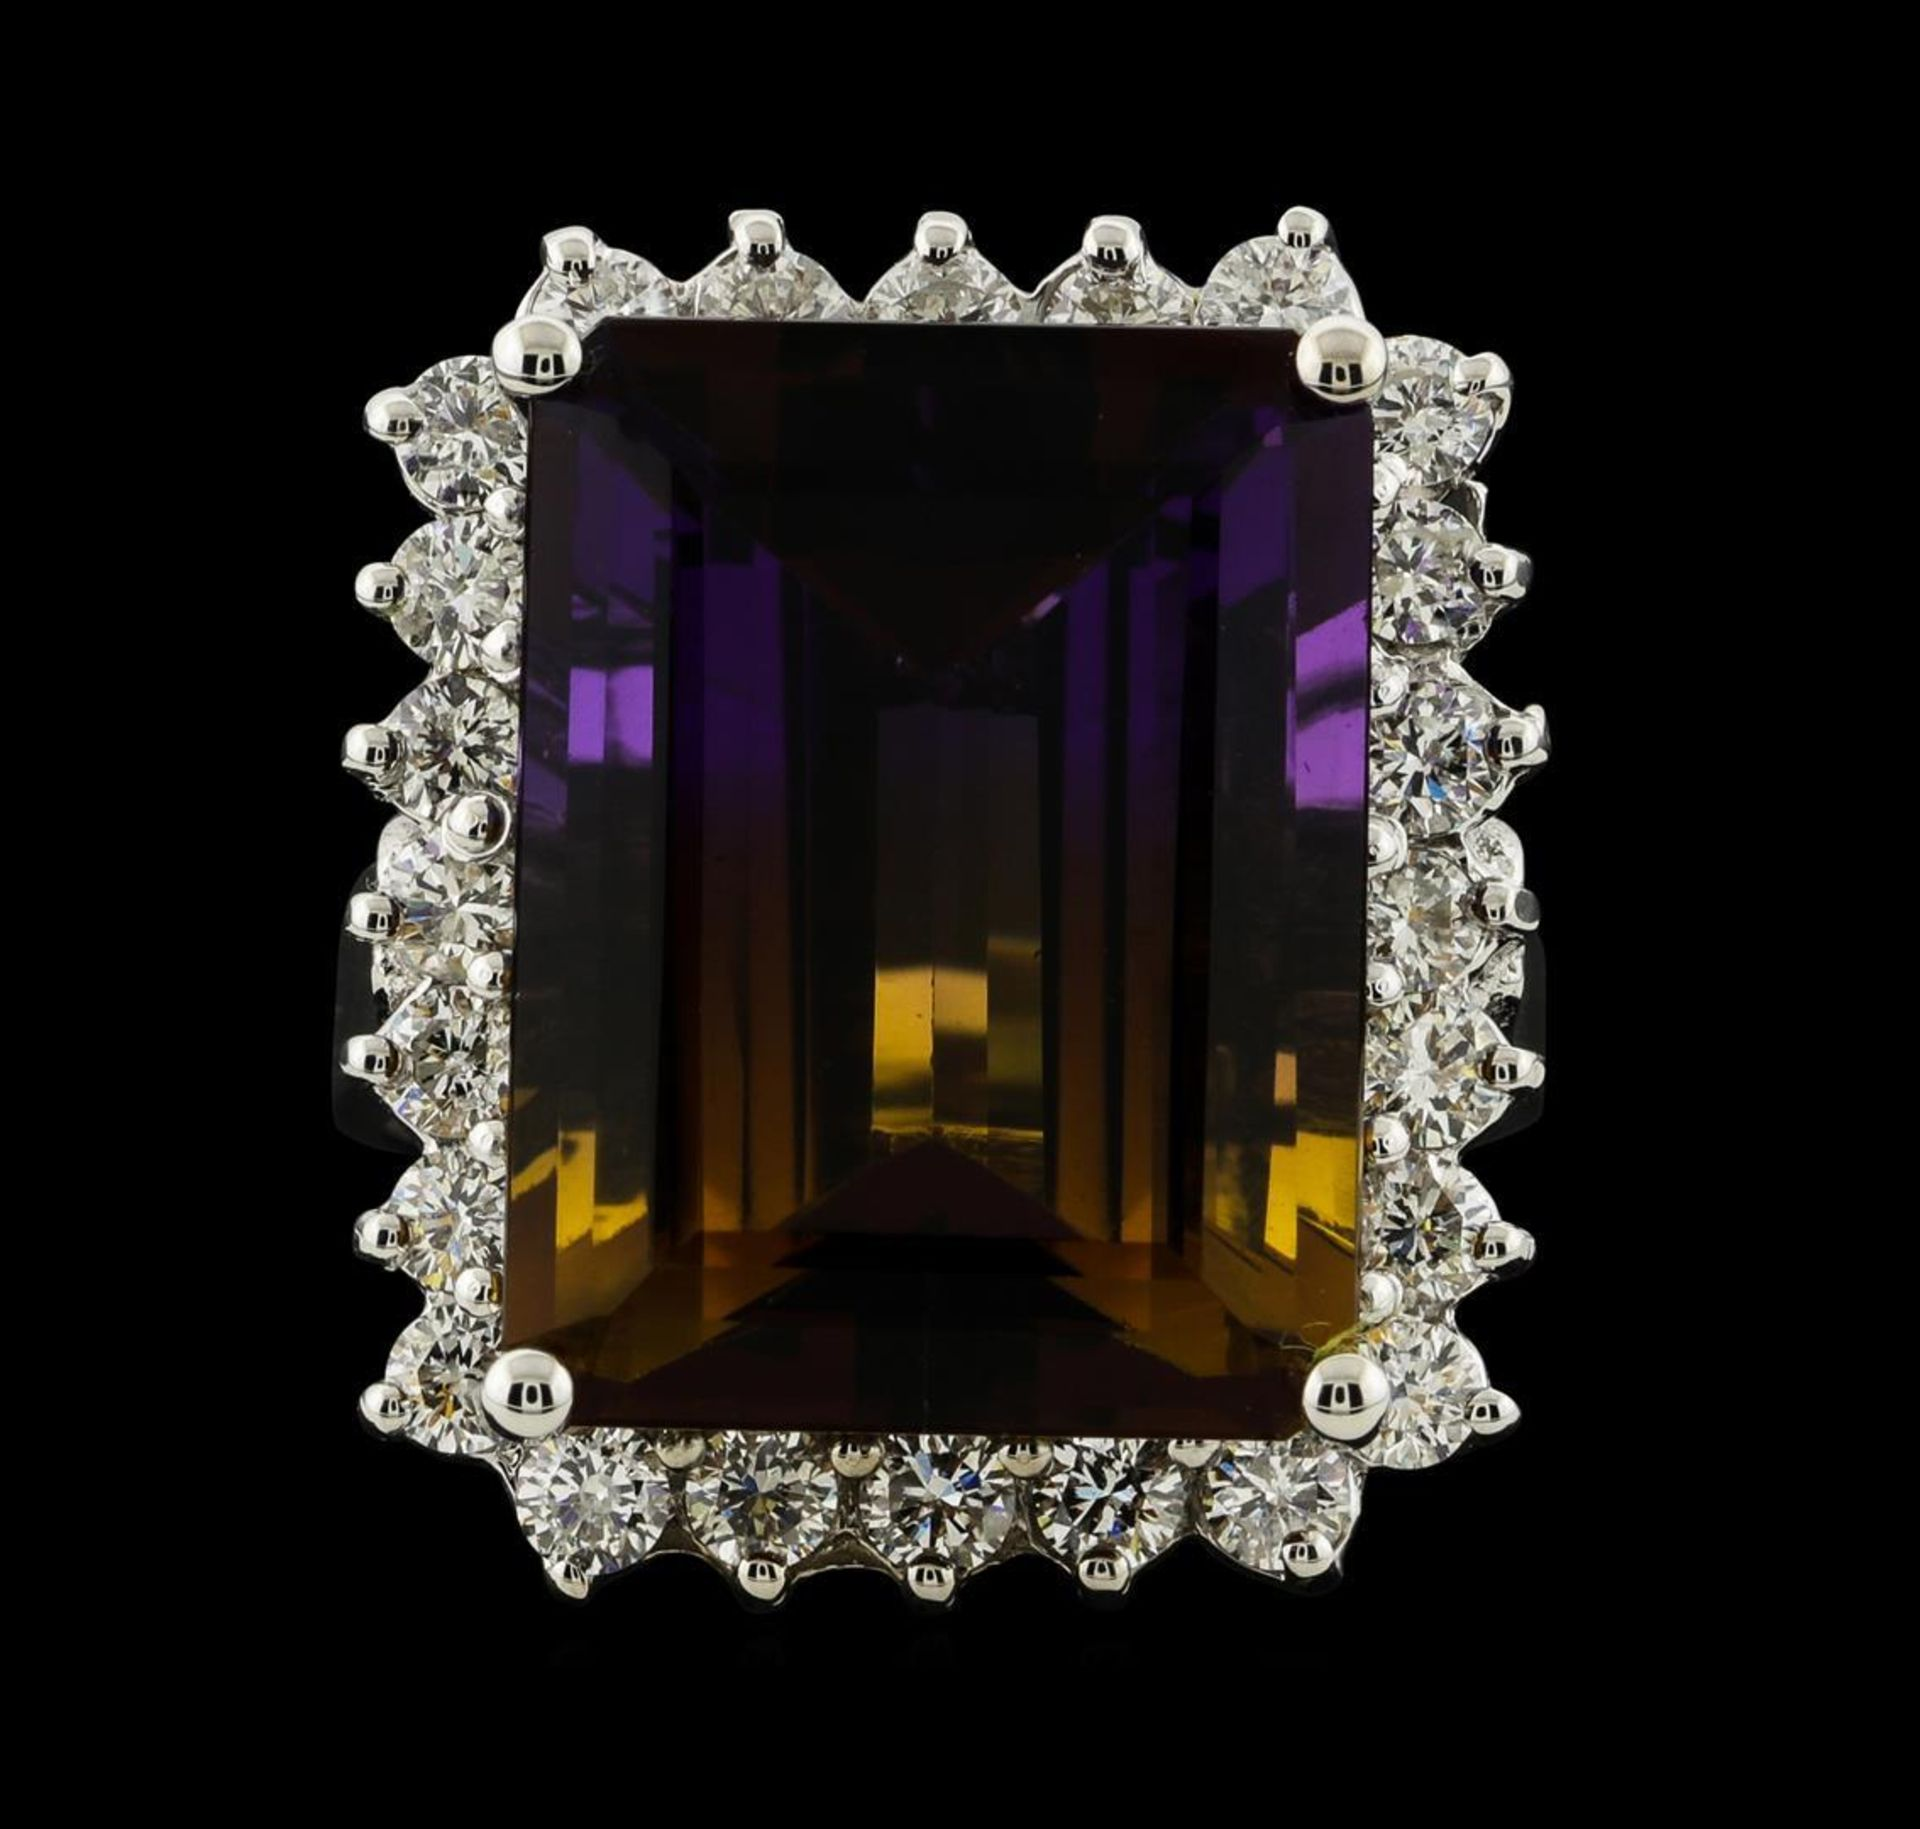 11.78 ctw Ametrine Quartz and Diamond Ring - 14KT White Gold - Image 2 of 5